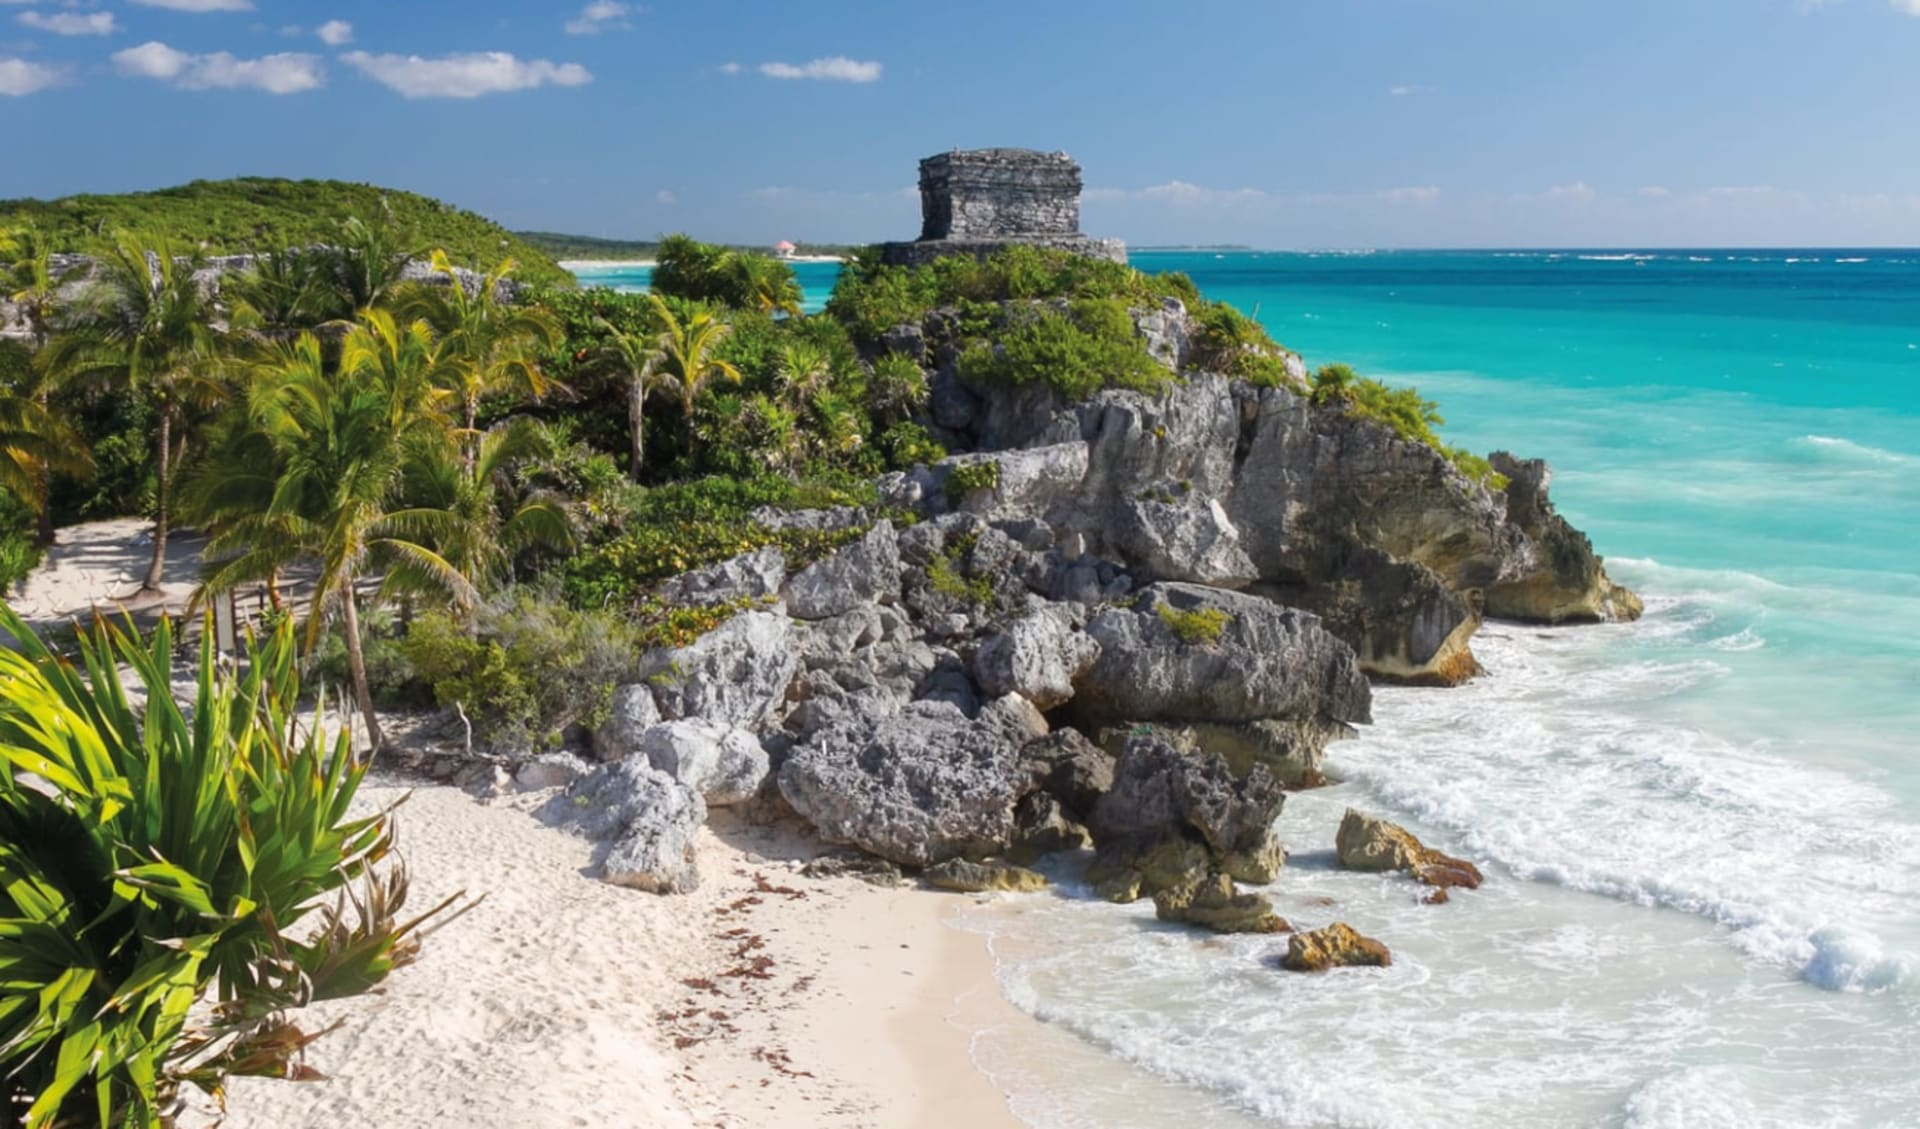 Yucatán und Chiapas ab Cancun: Mexico - Yucatan - Maya Ruinen Tulum